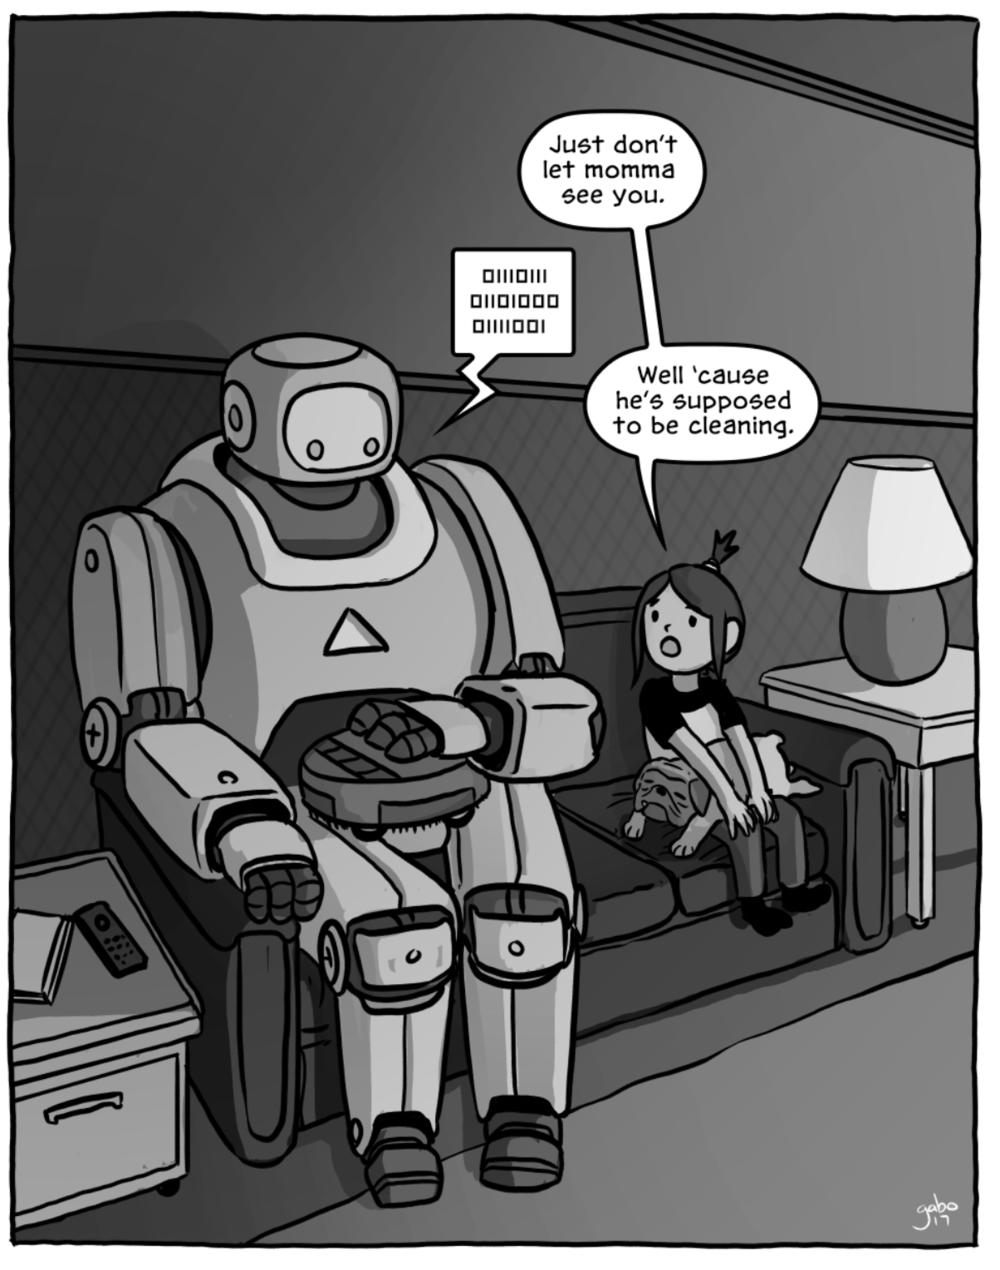 019-Bot'sBestFriend.png